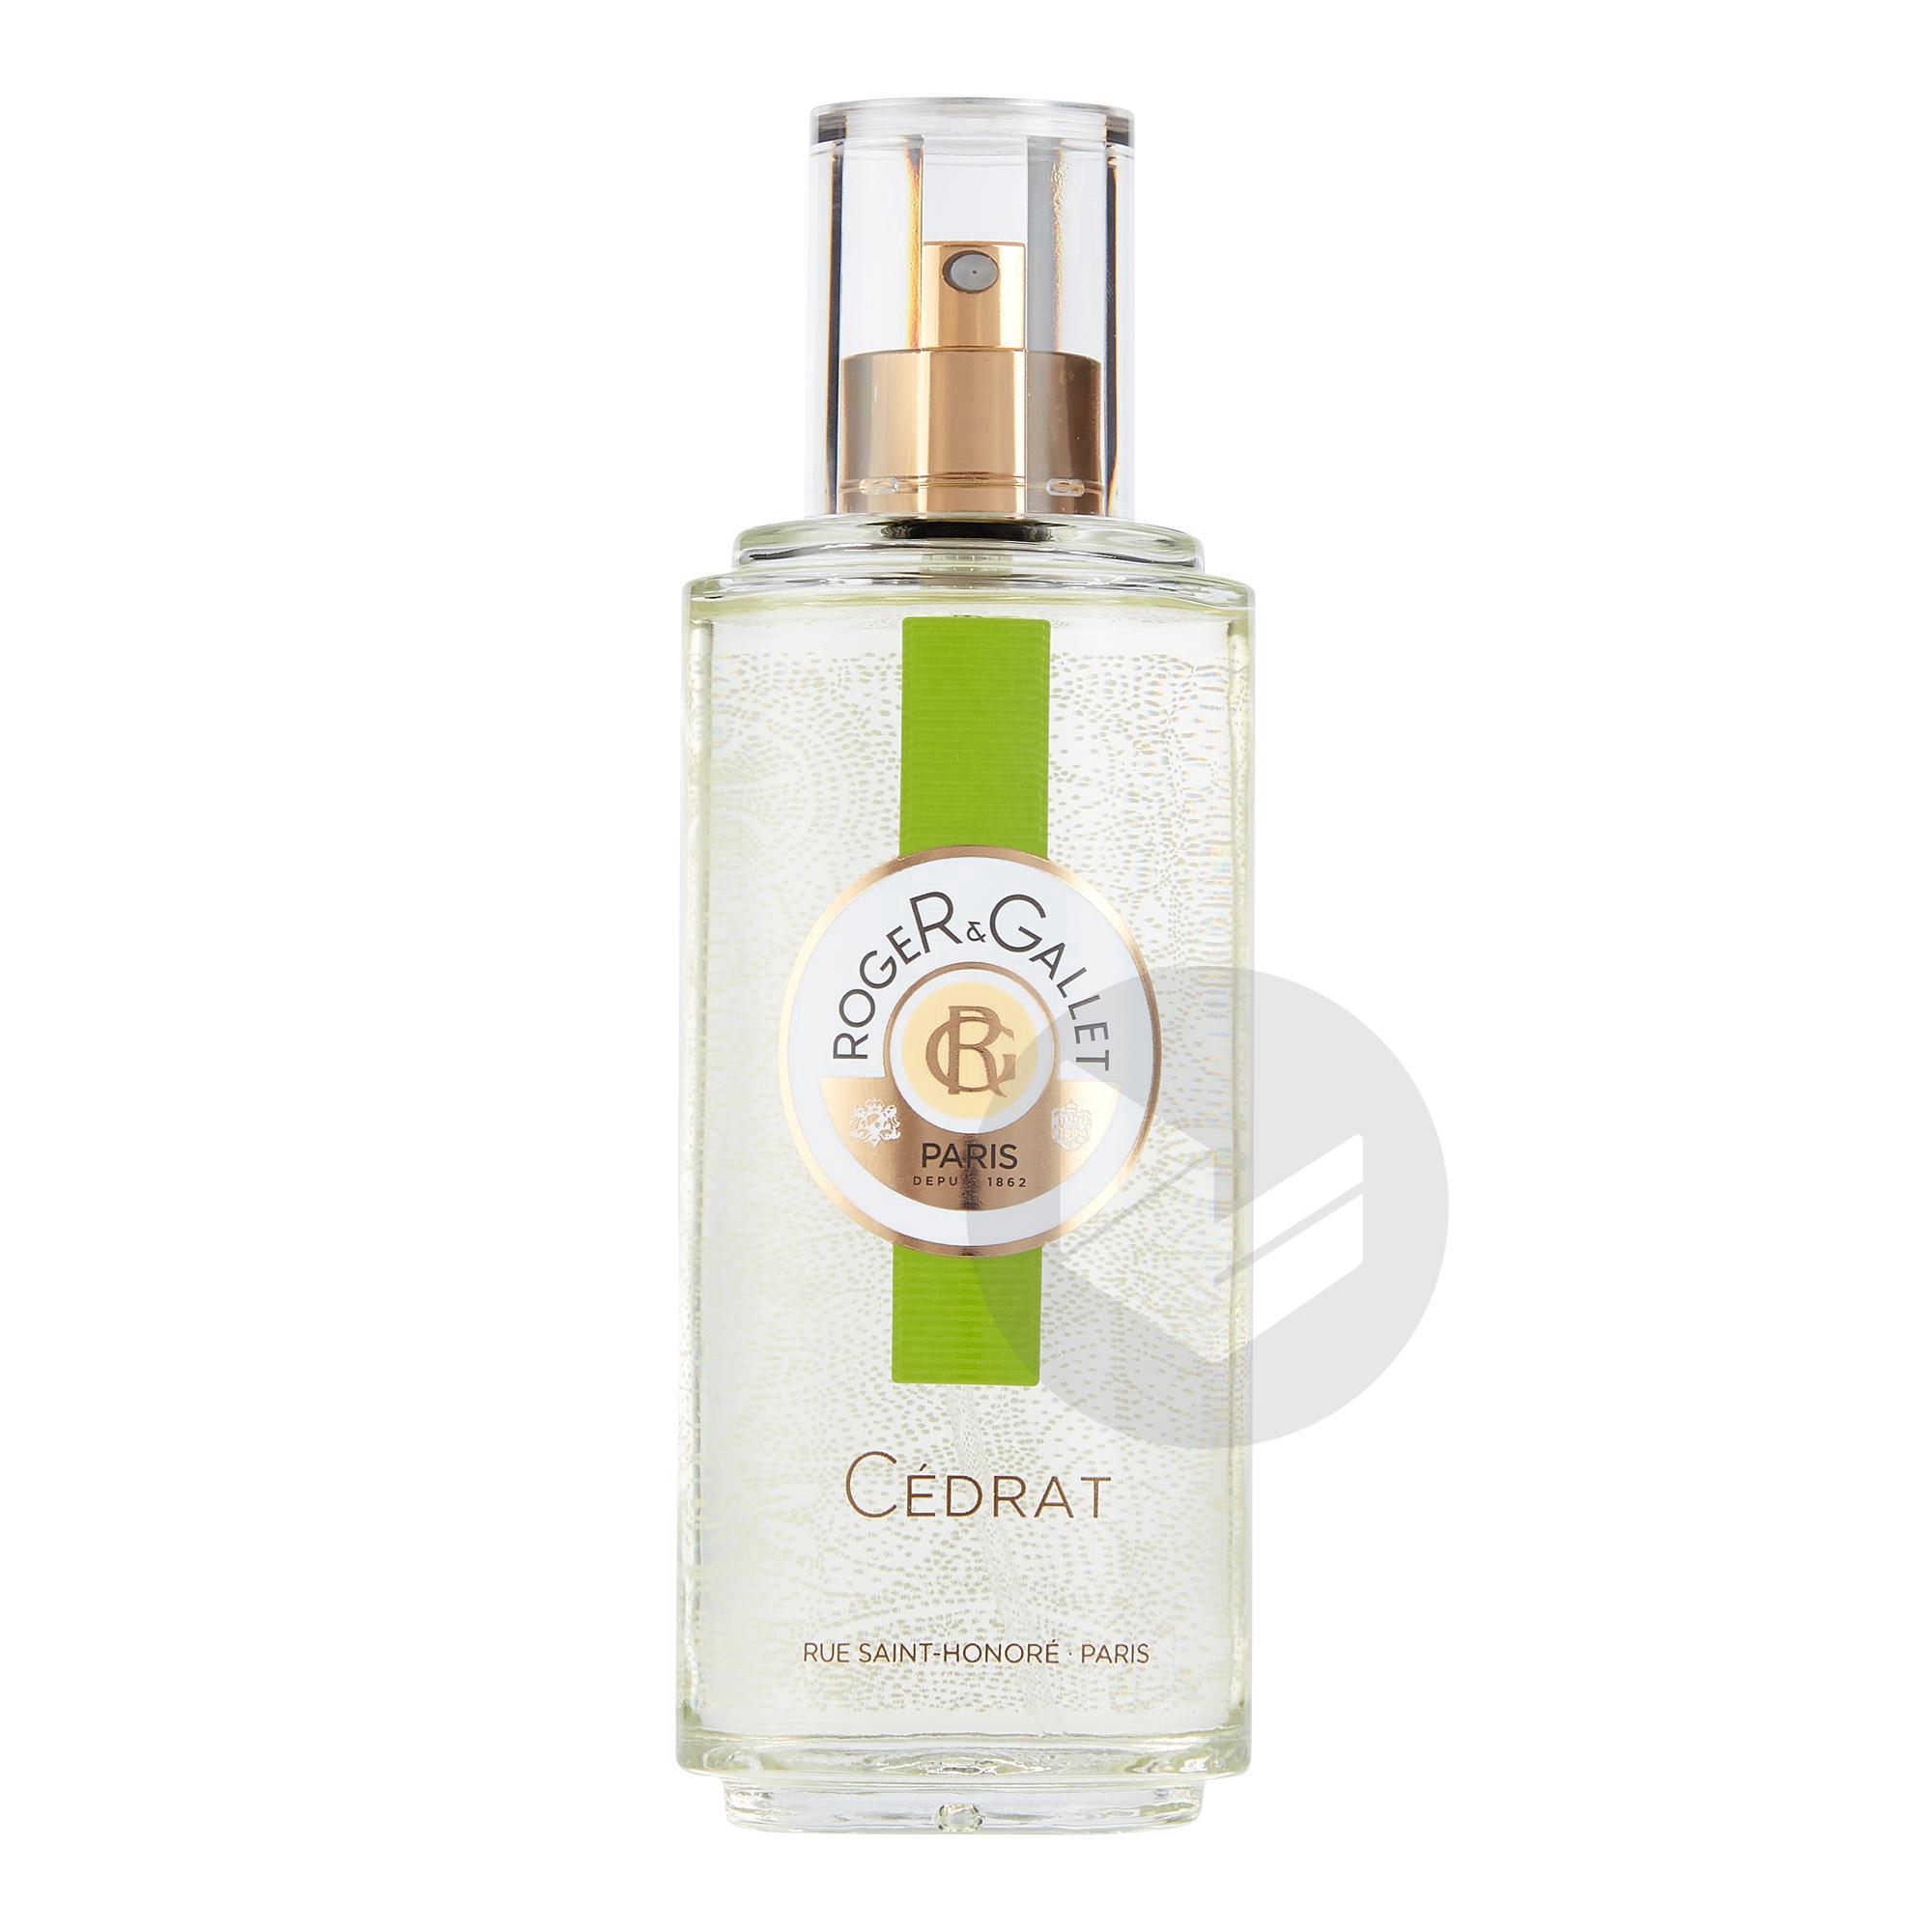 Cedrat Eau Fraiche Parfumee Bienfaisante Vaporisateur 100 Ml